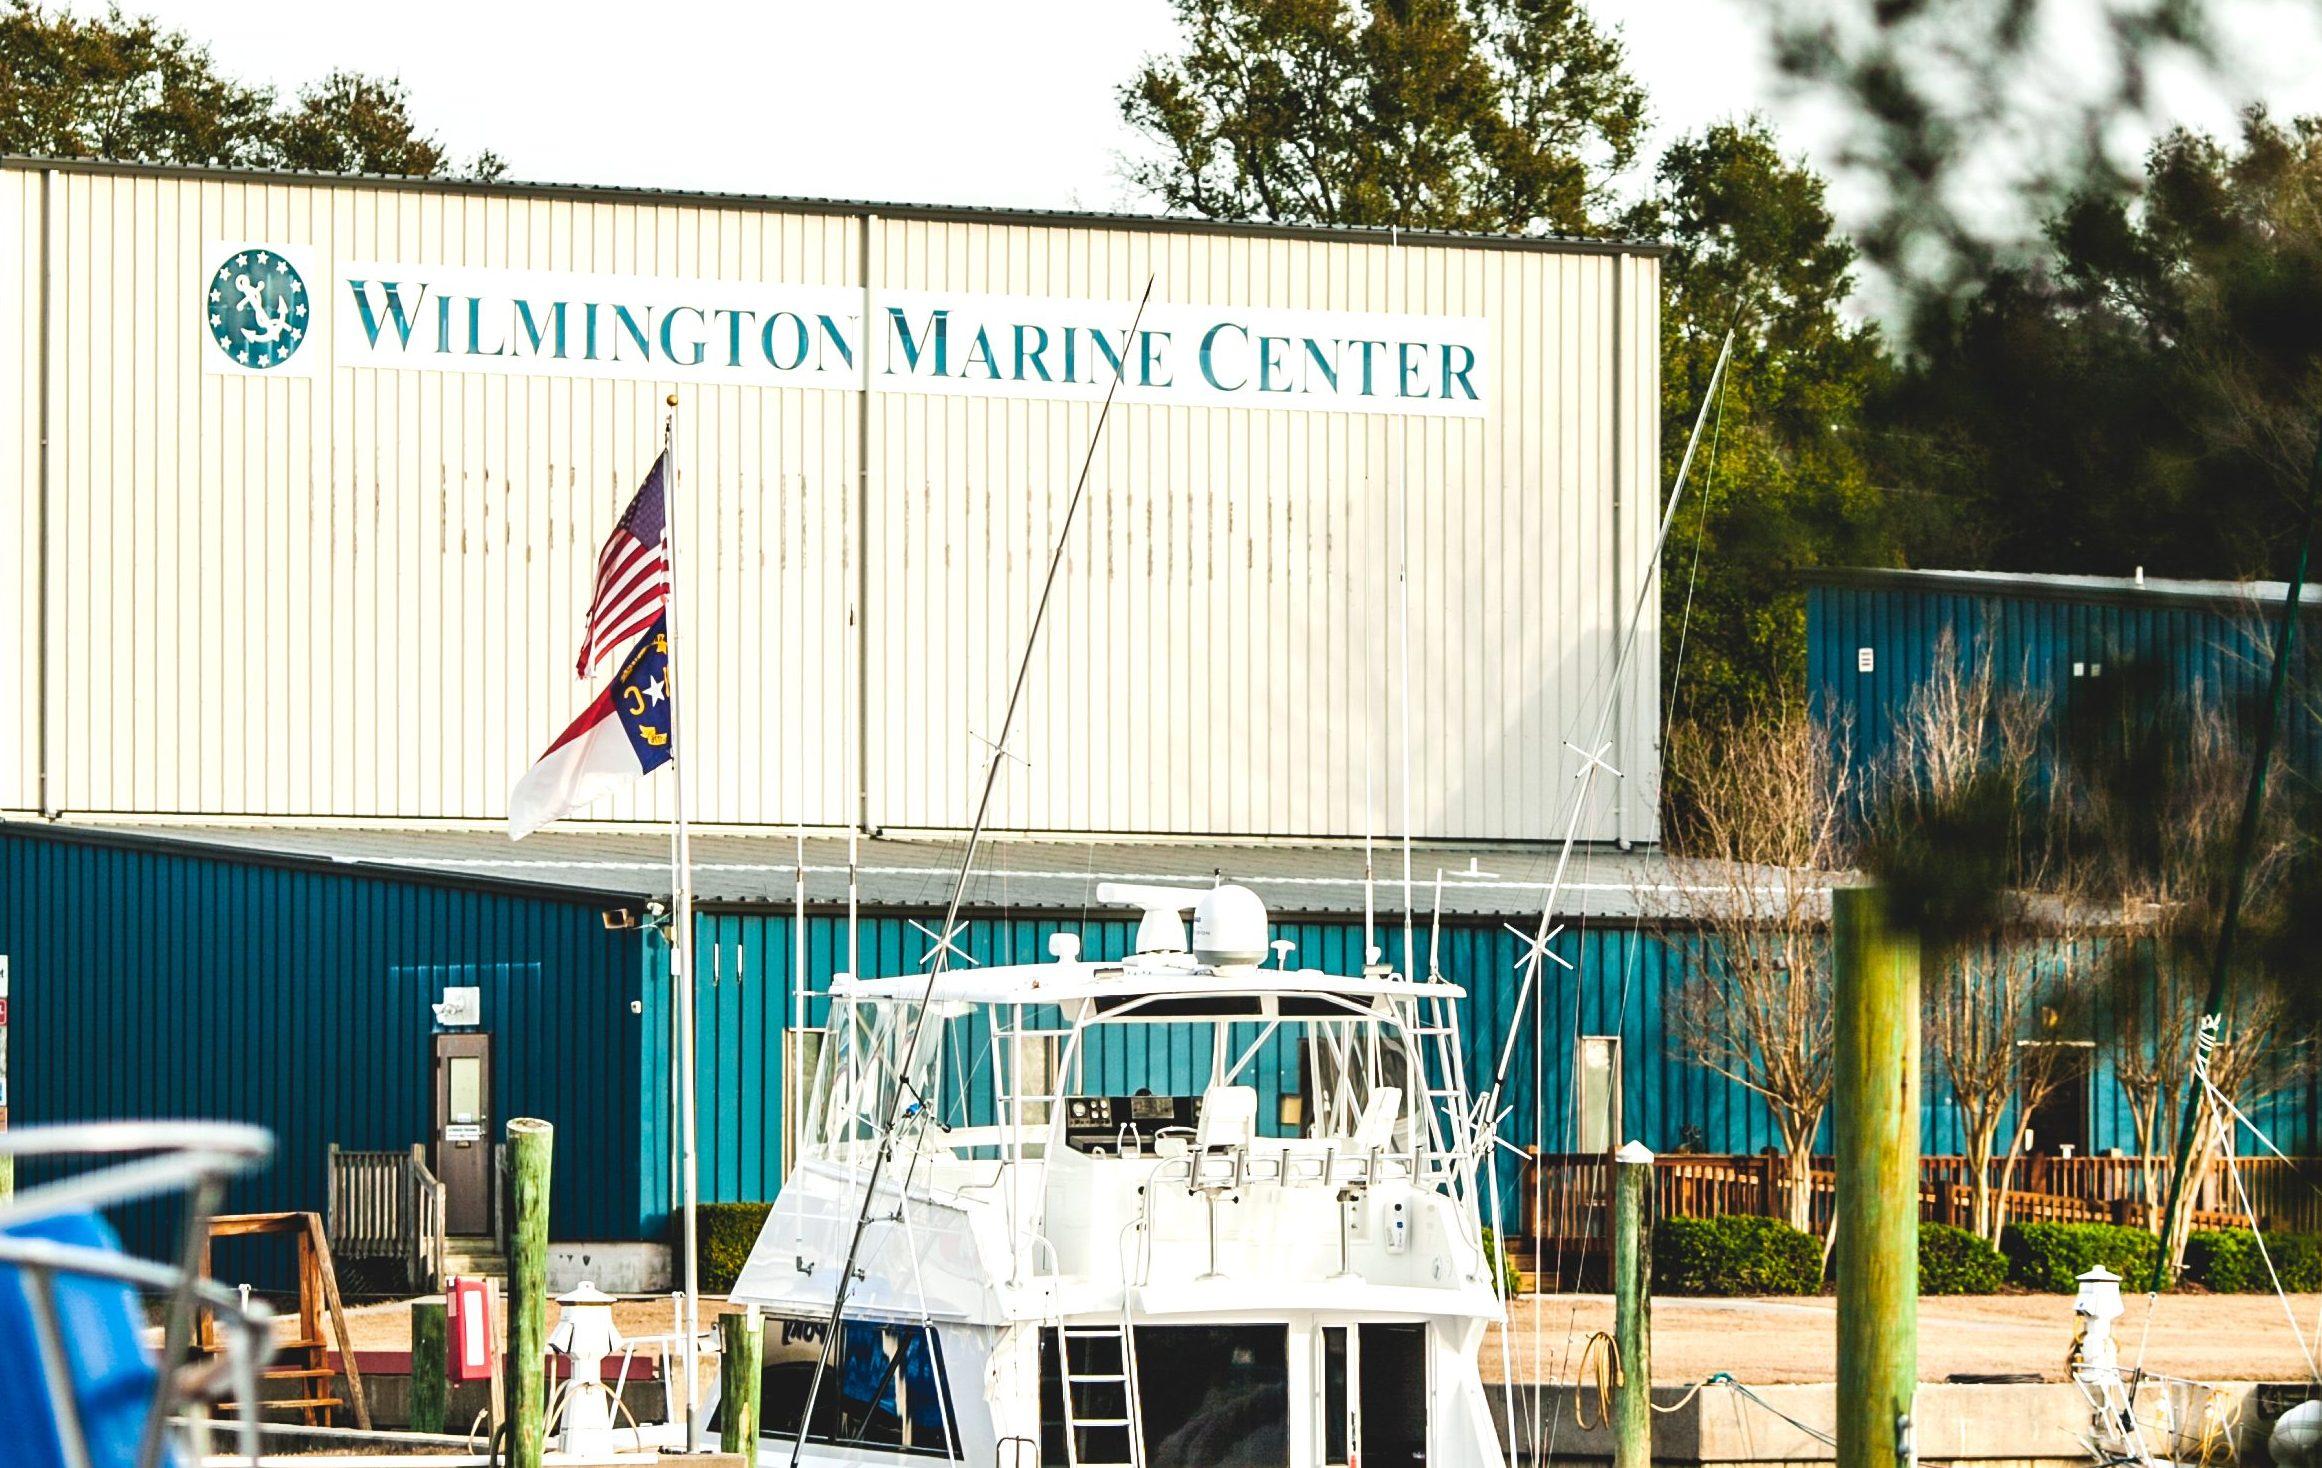 wilmington marine center office